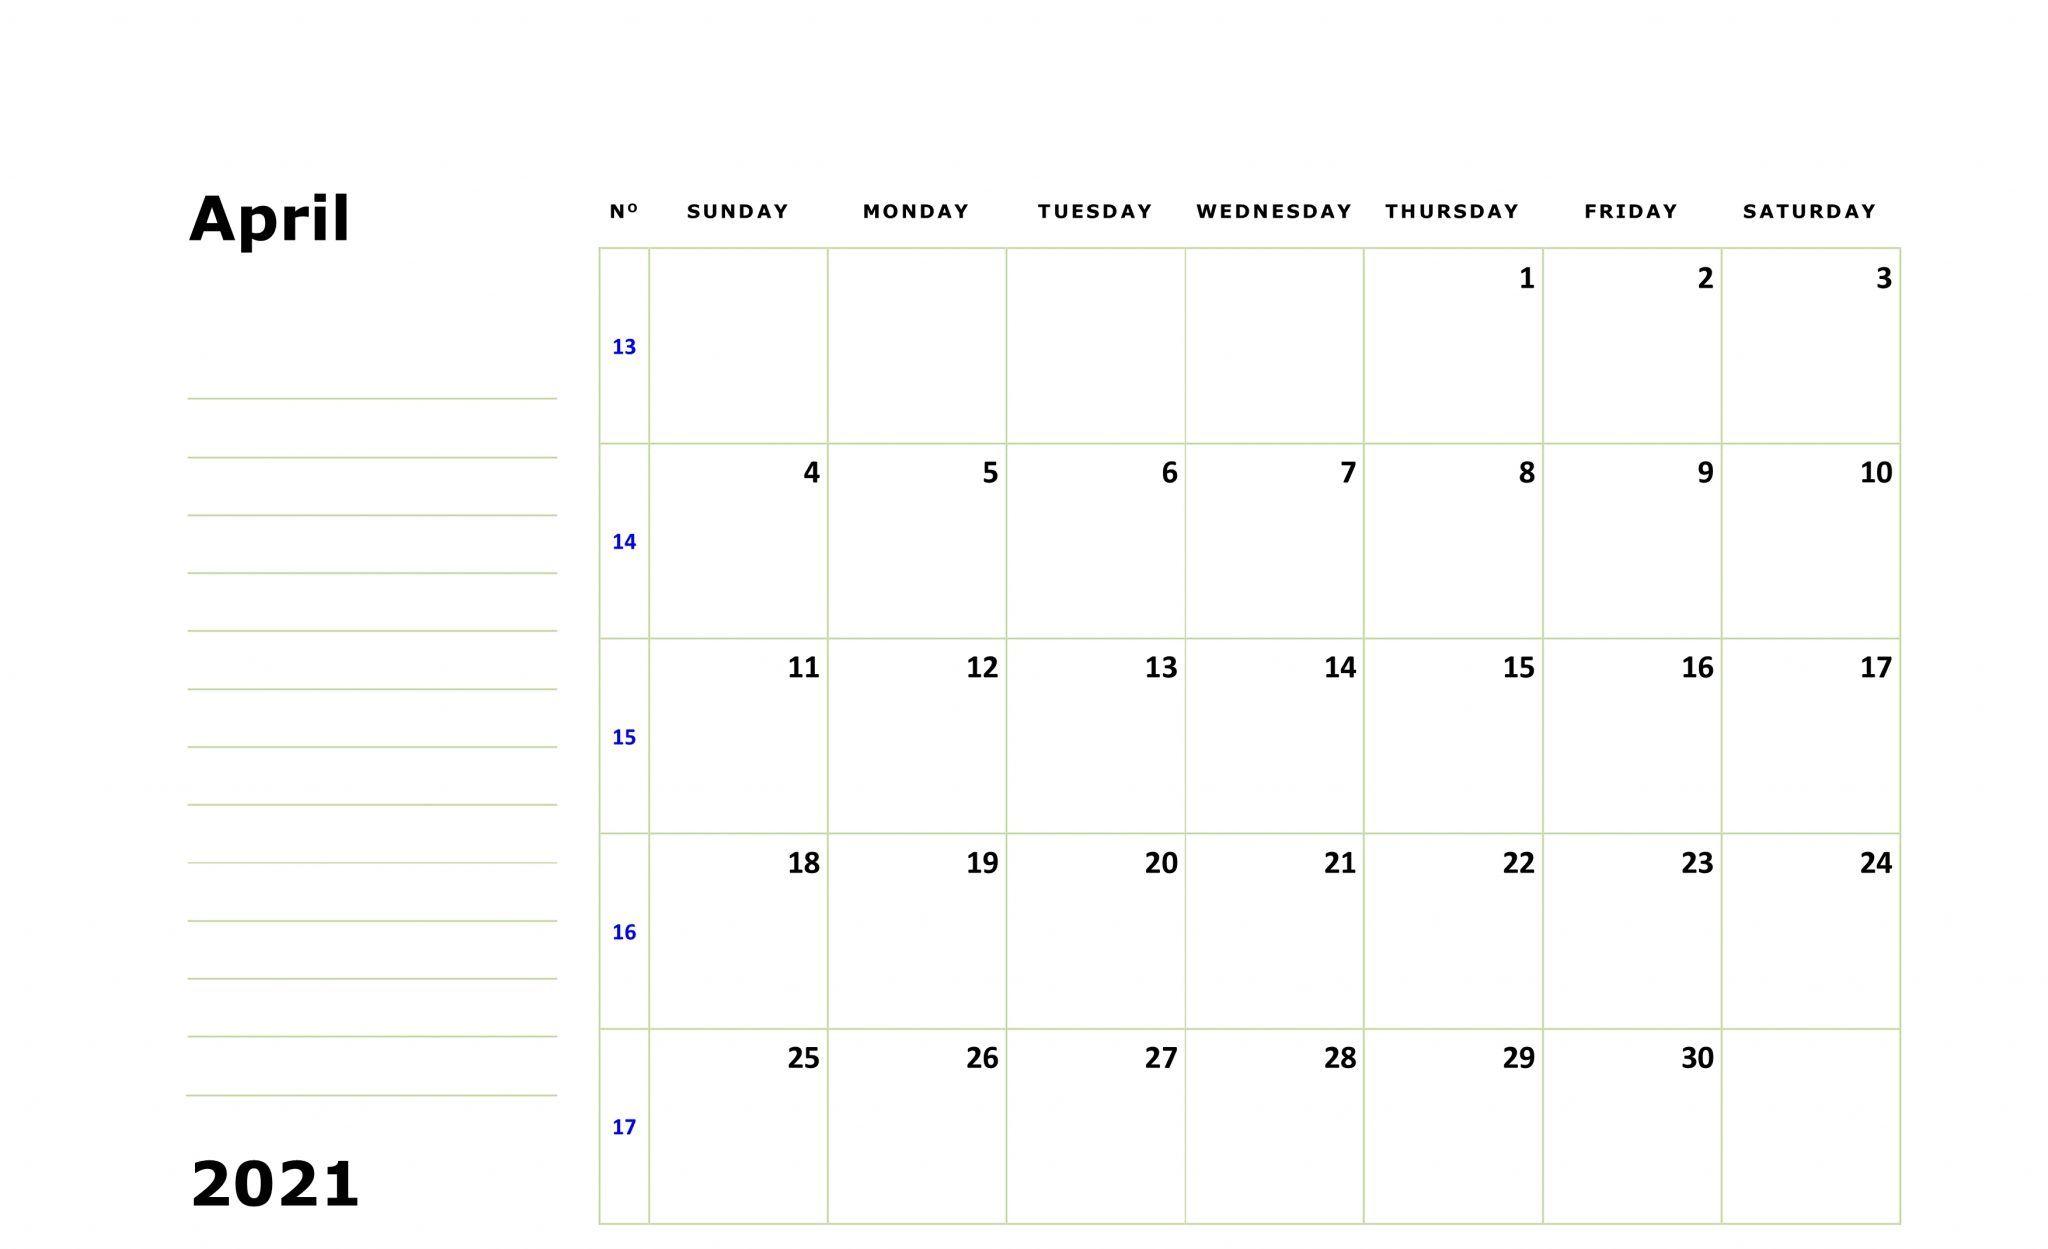 April 2021 Fillable Calendar Notes